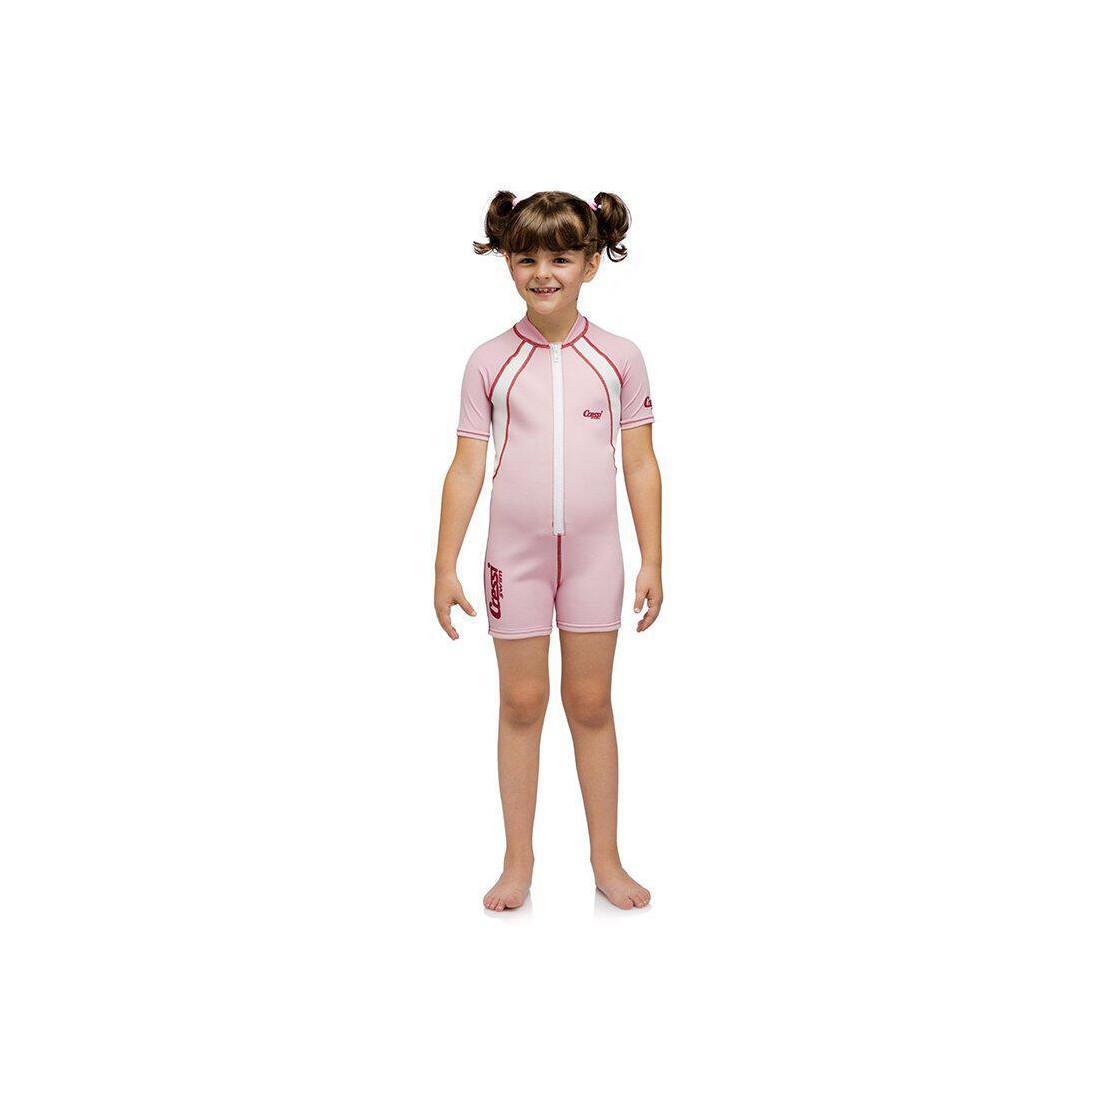 e5188b2d574 Στολή Κολύμβησης Cressi Kids Shorty